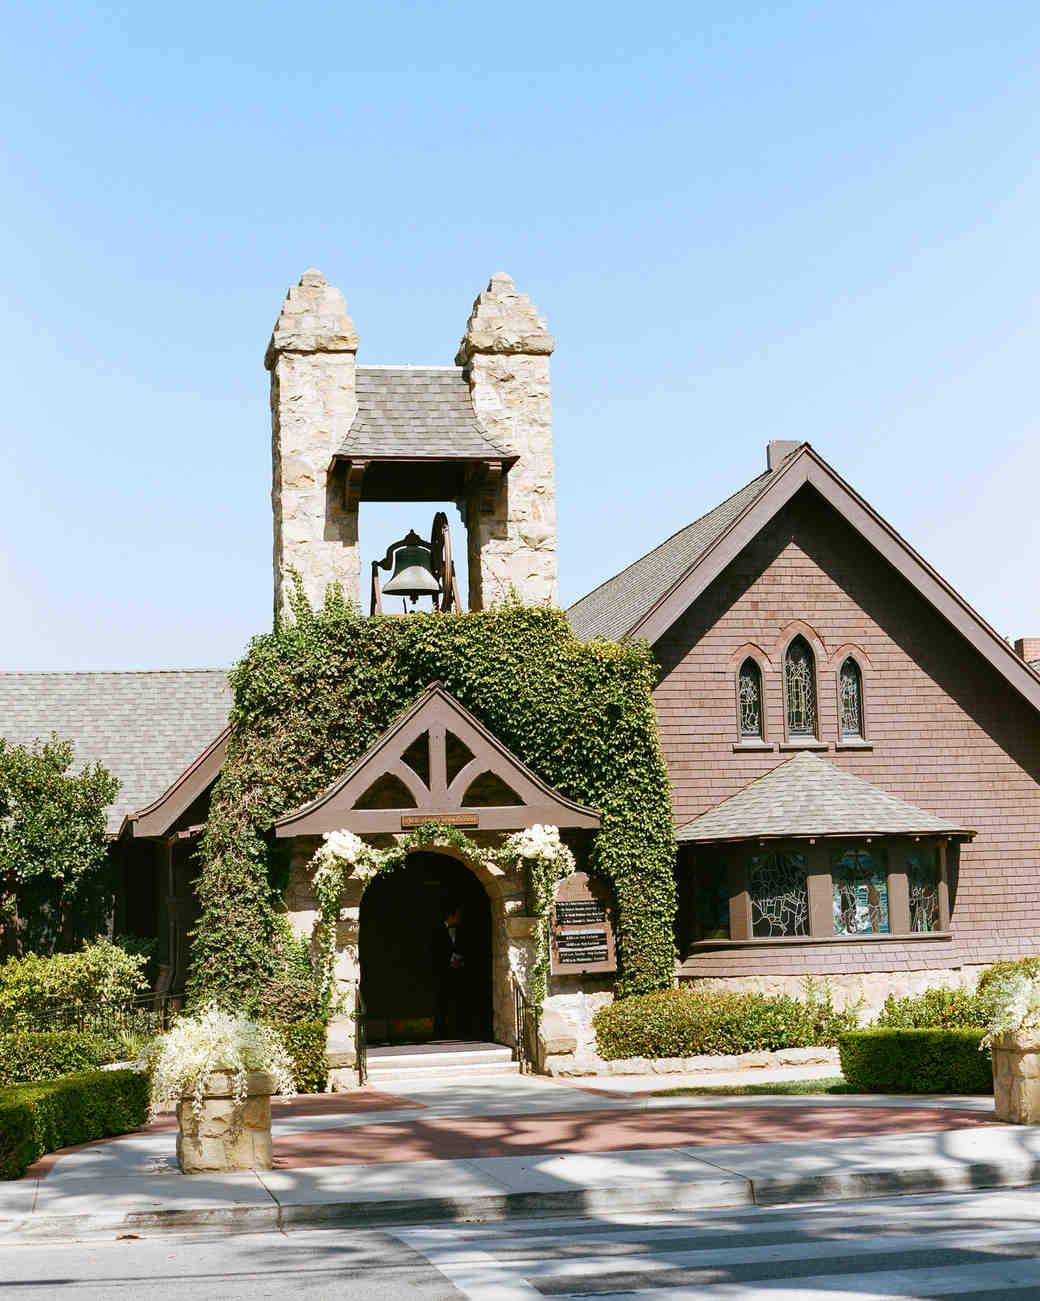 tiffany-david-wedding-venue-1964-s112676-1115.jpg